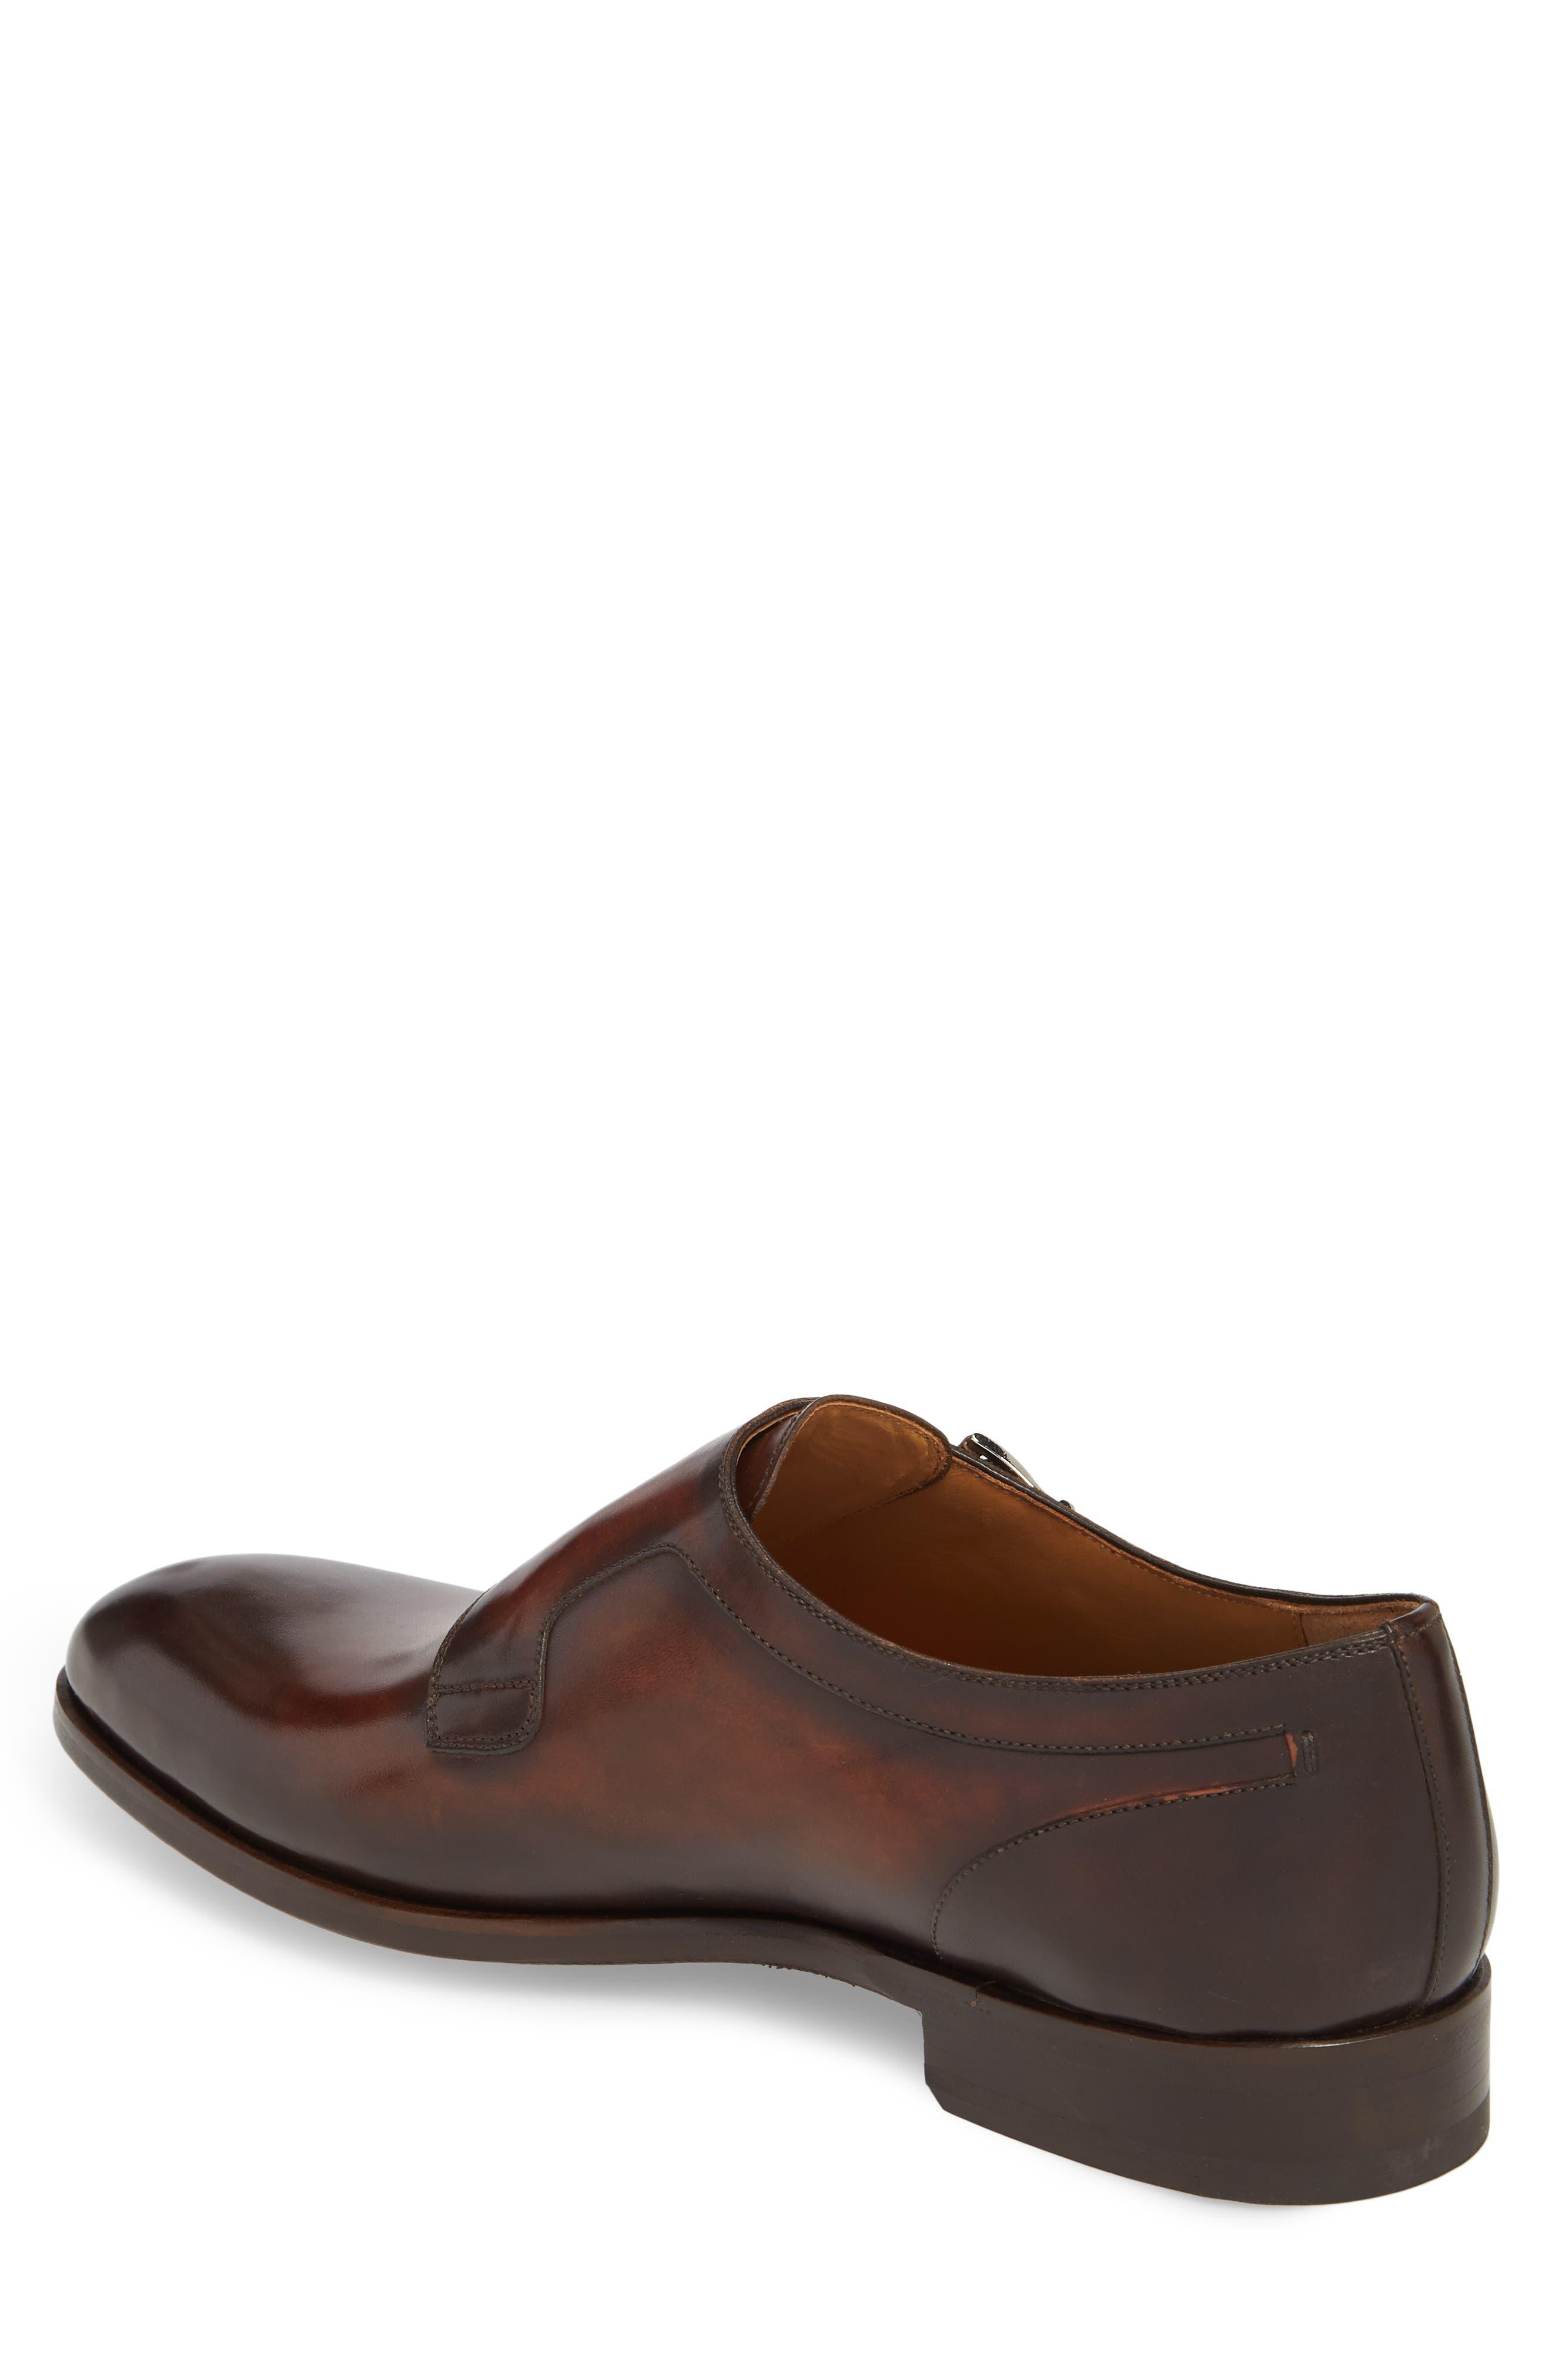 Pratt Double Strap Monk Shoe,                             Alternate thumbnail 2, color,                             Tabaco Leather